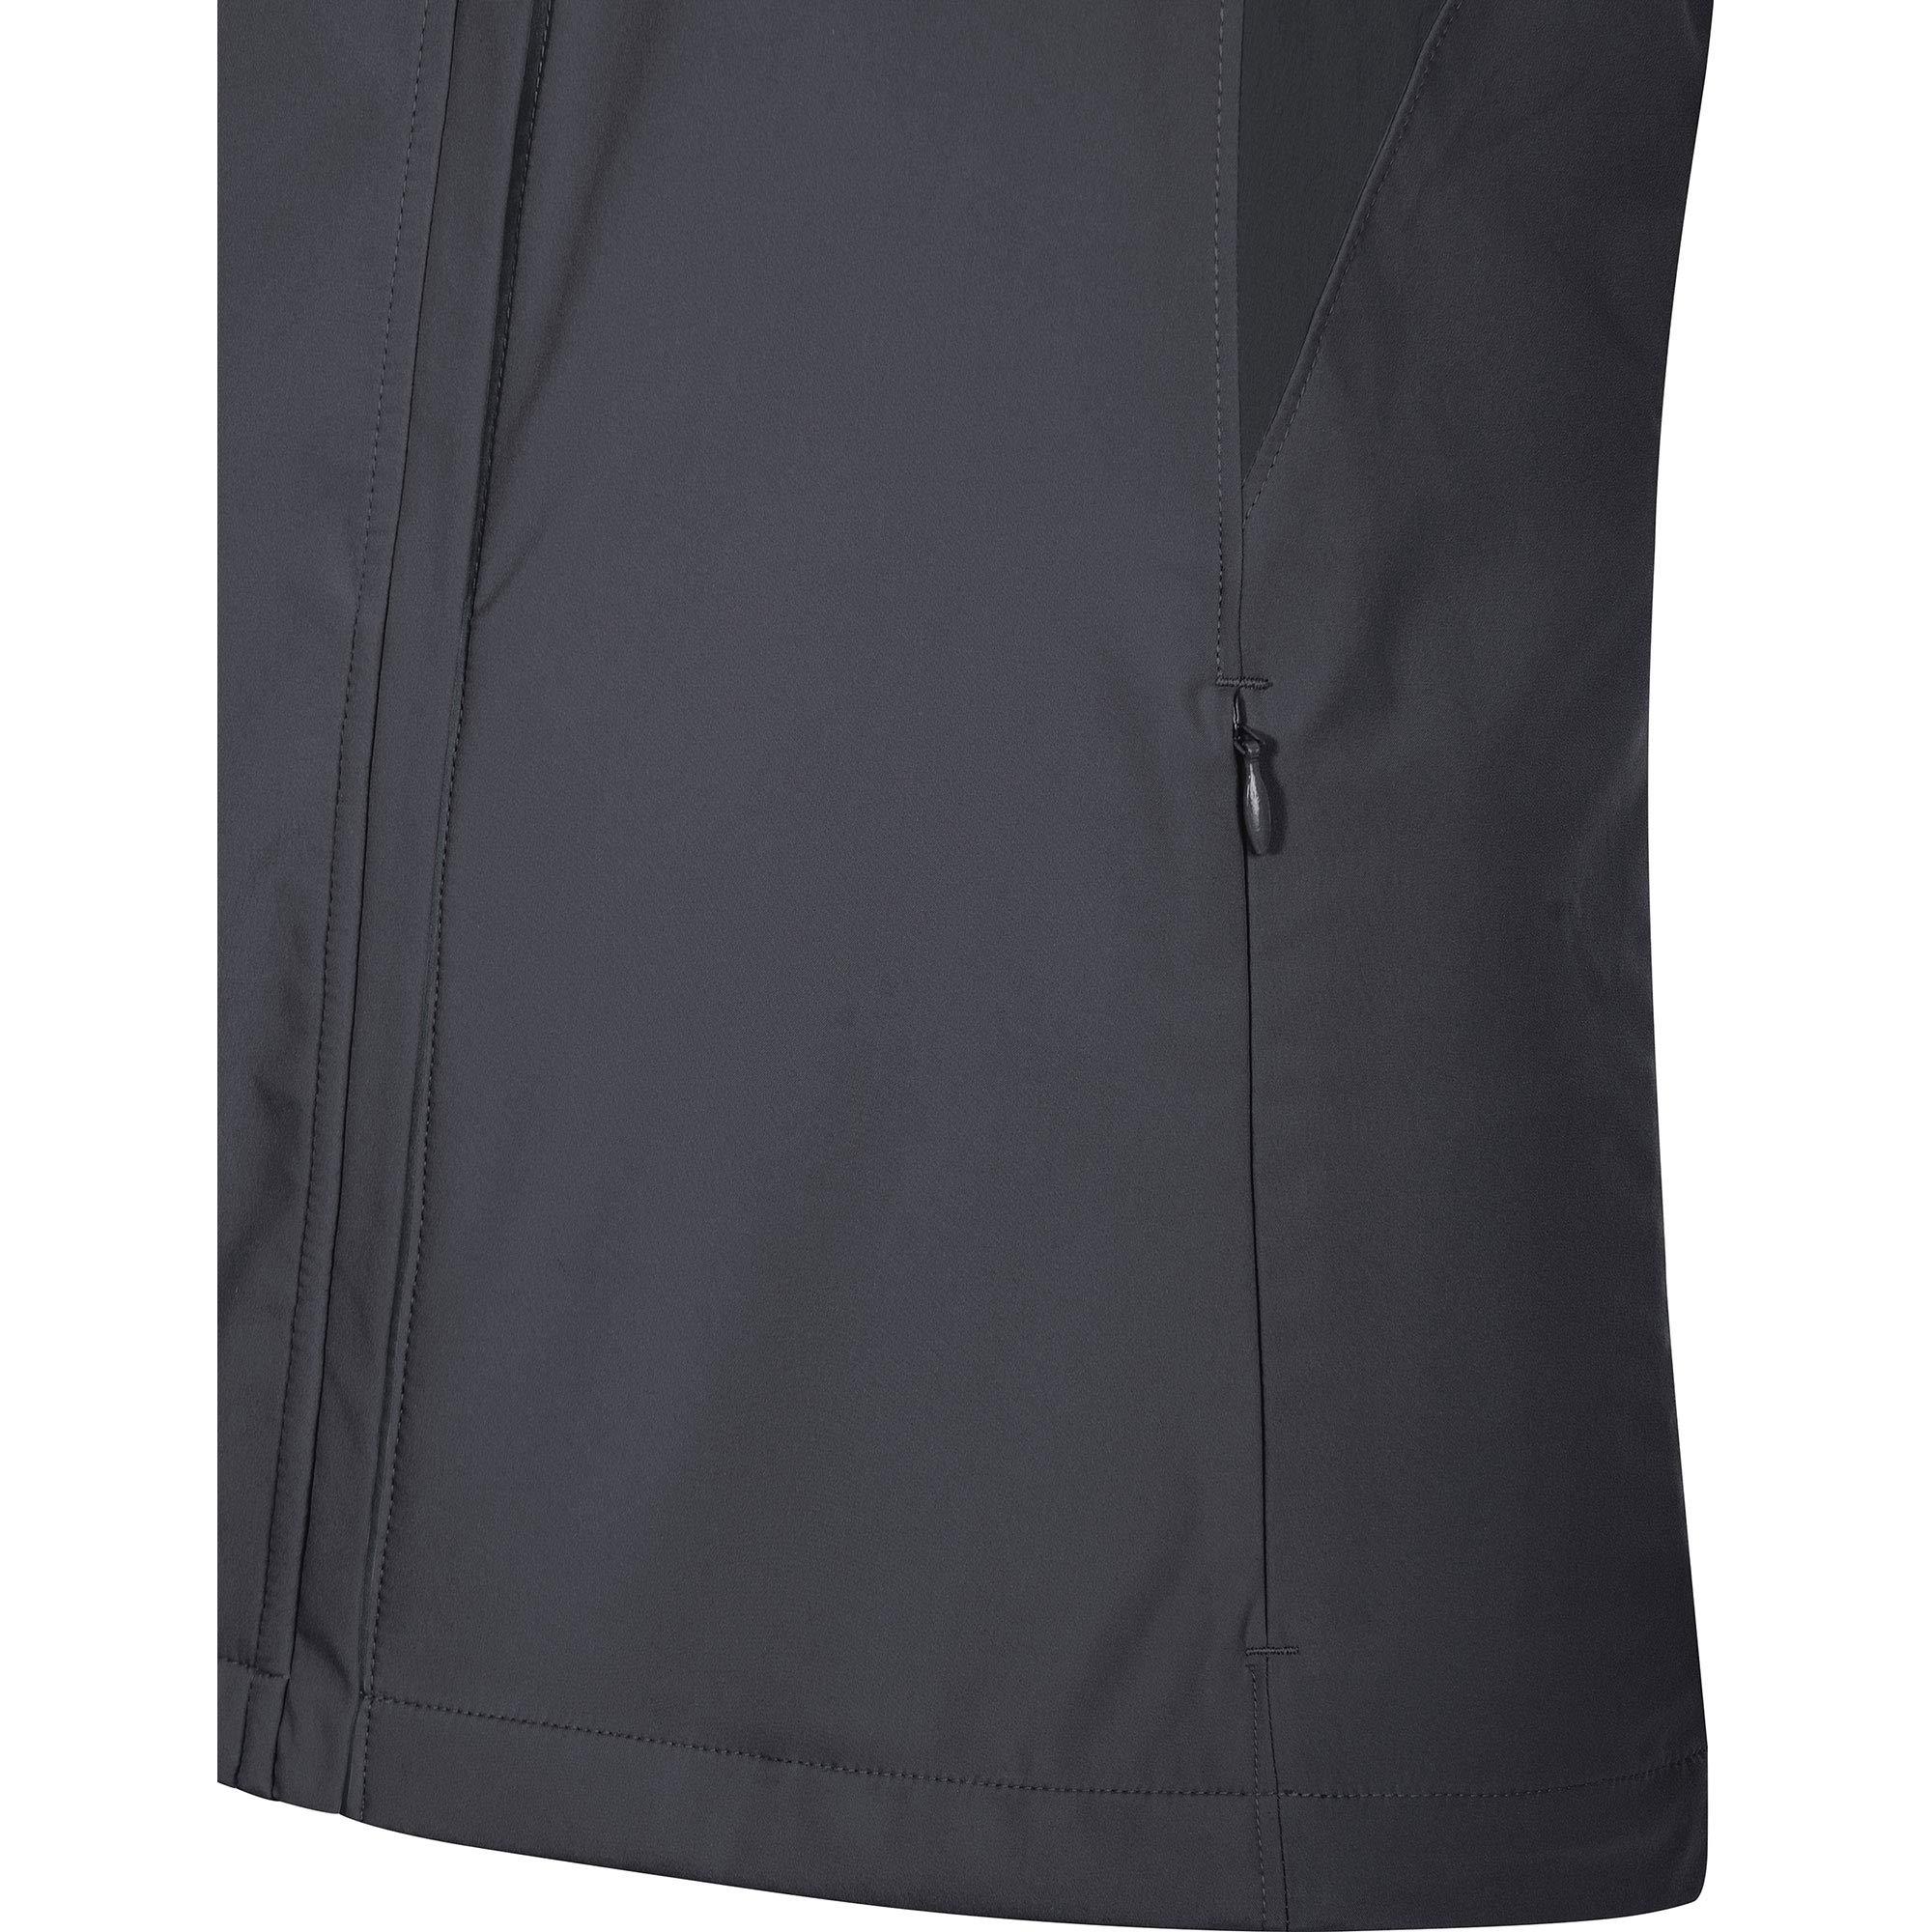 Gore Women's R3 Wmn Partial Gws Jacket,  terra grey/black,  M by GORE WEAR (Image #6)